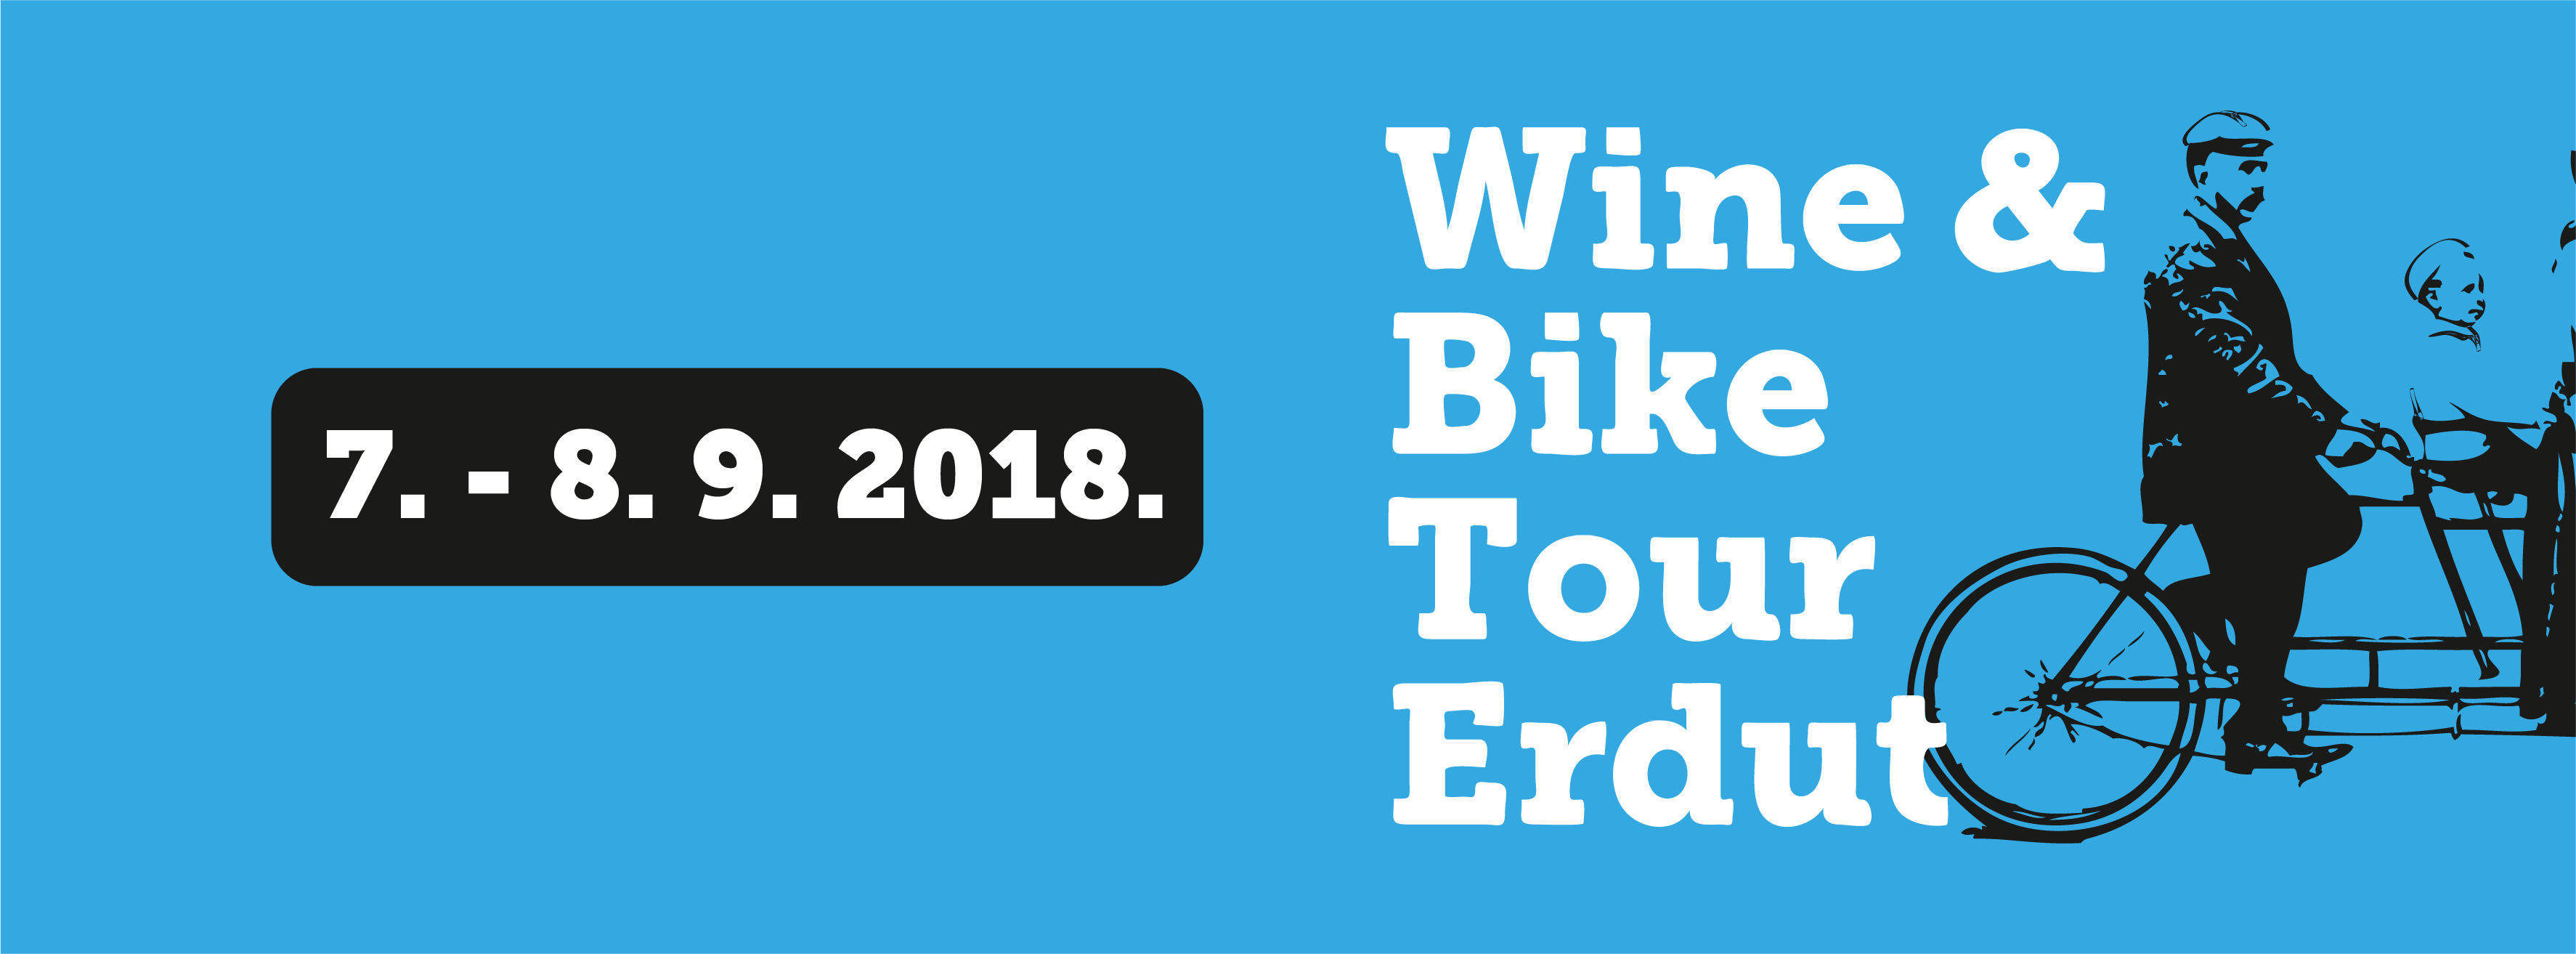 Wine & Bike Tour Erdut 2018